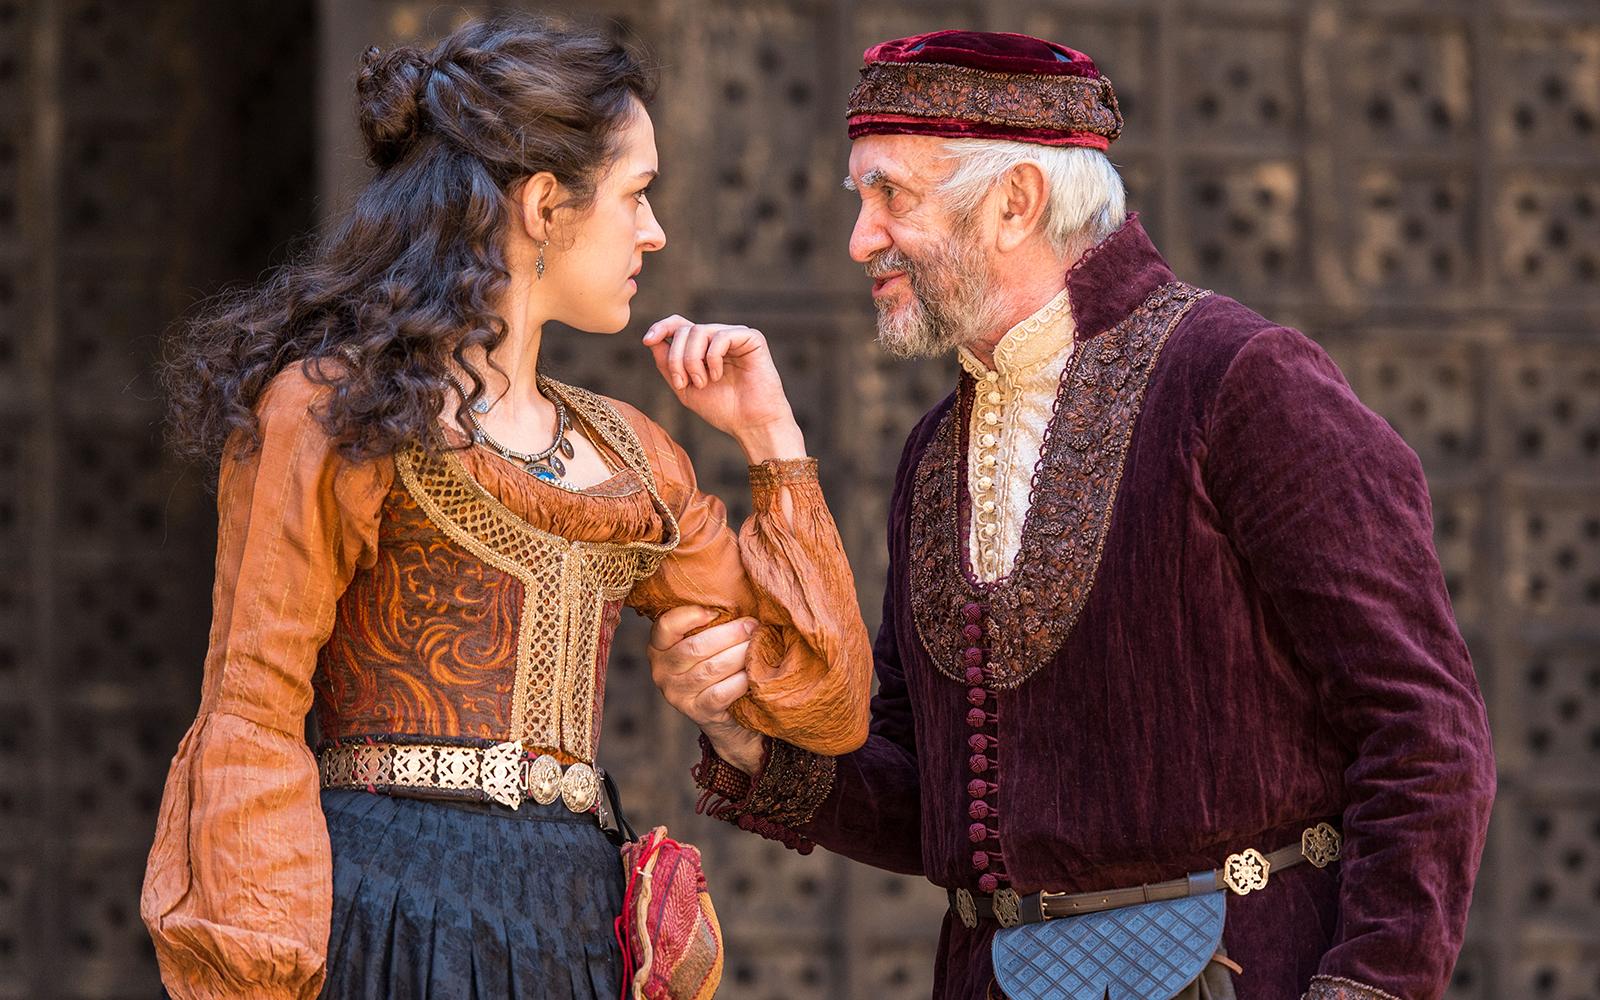 Shylock grabbing Jessica's arm in The Merchant of Venice